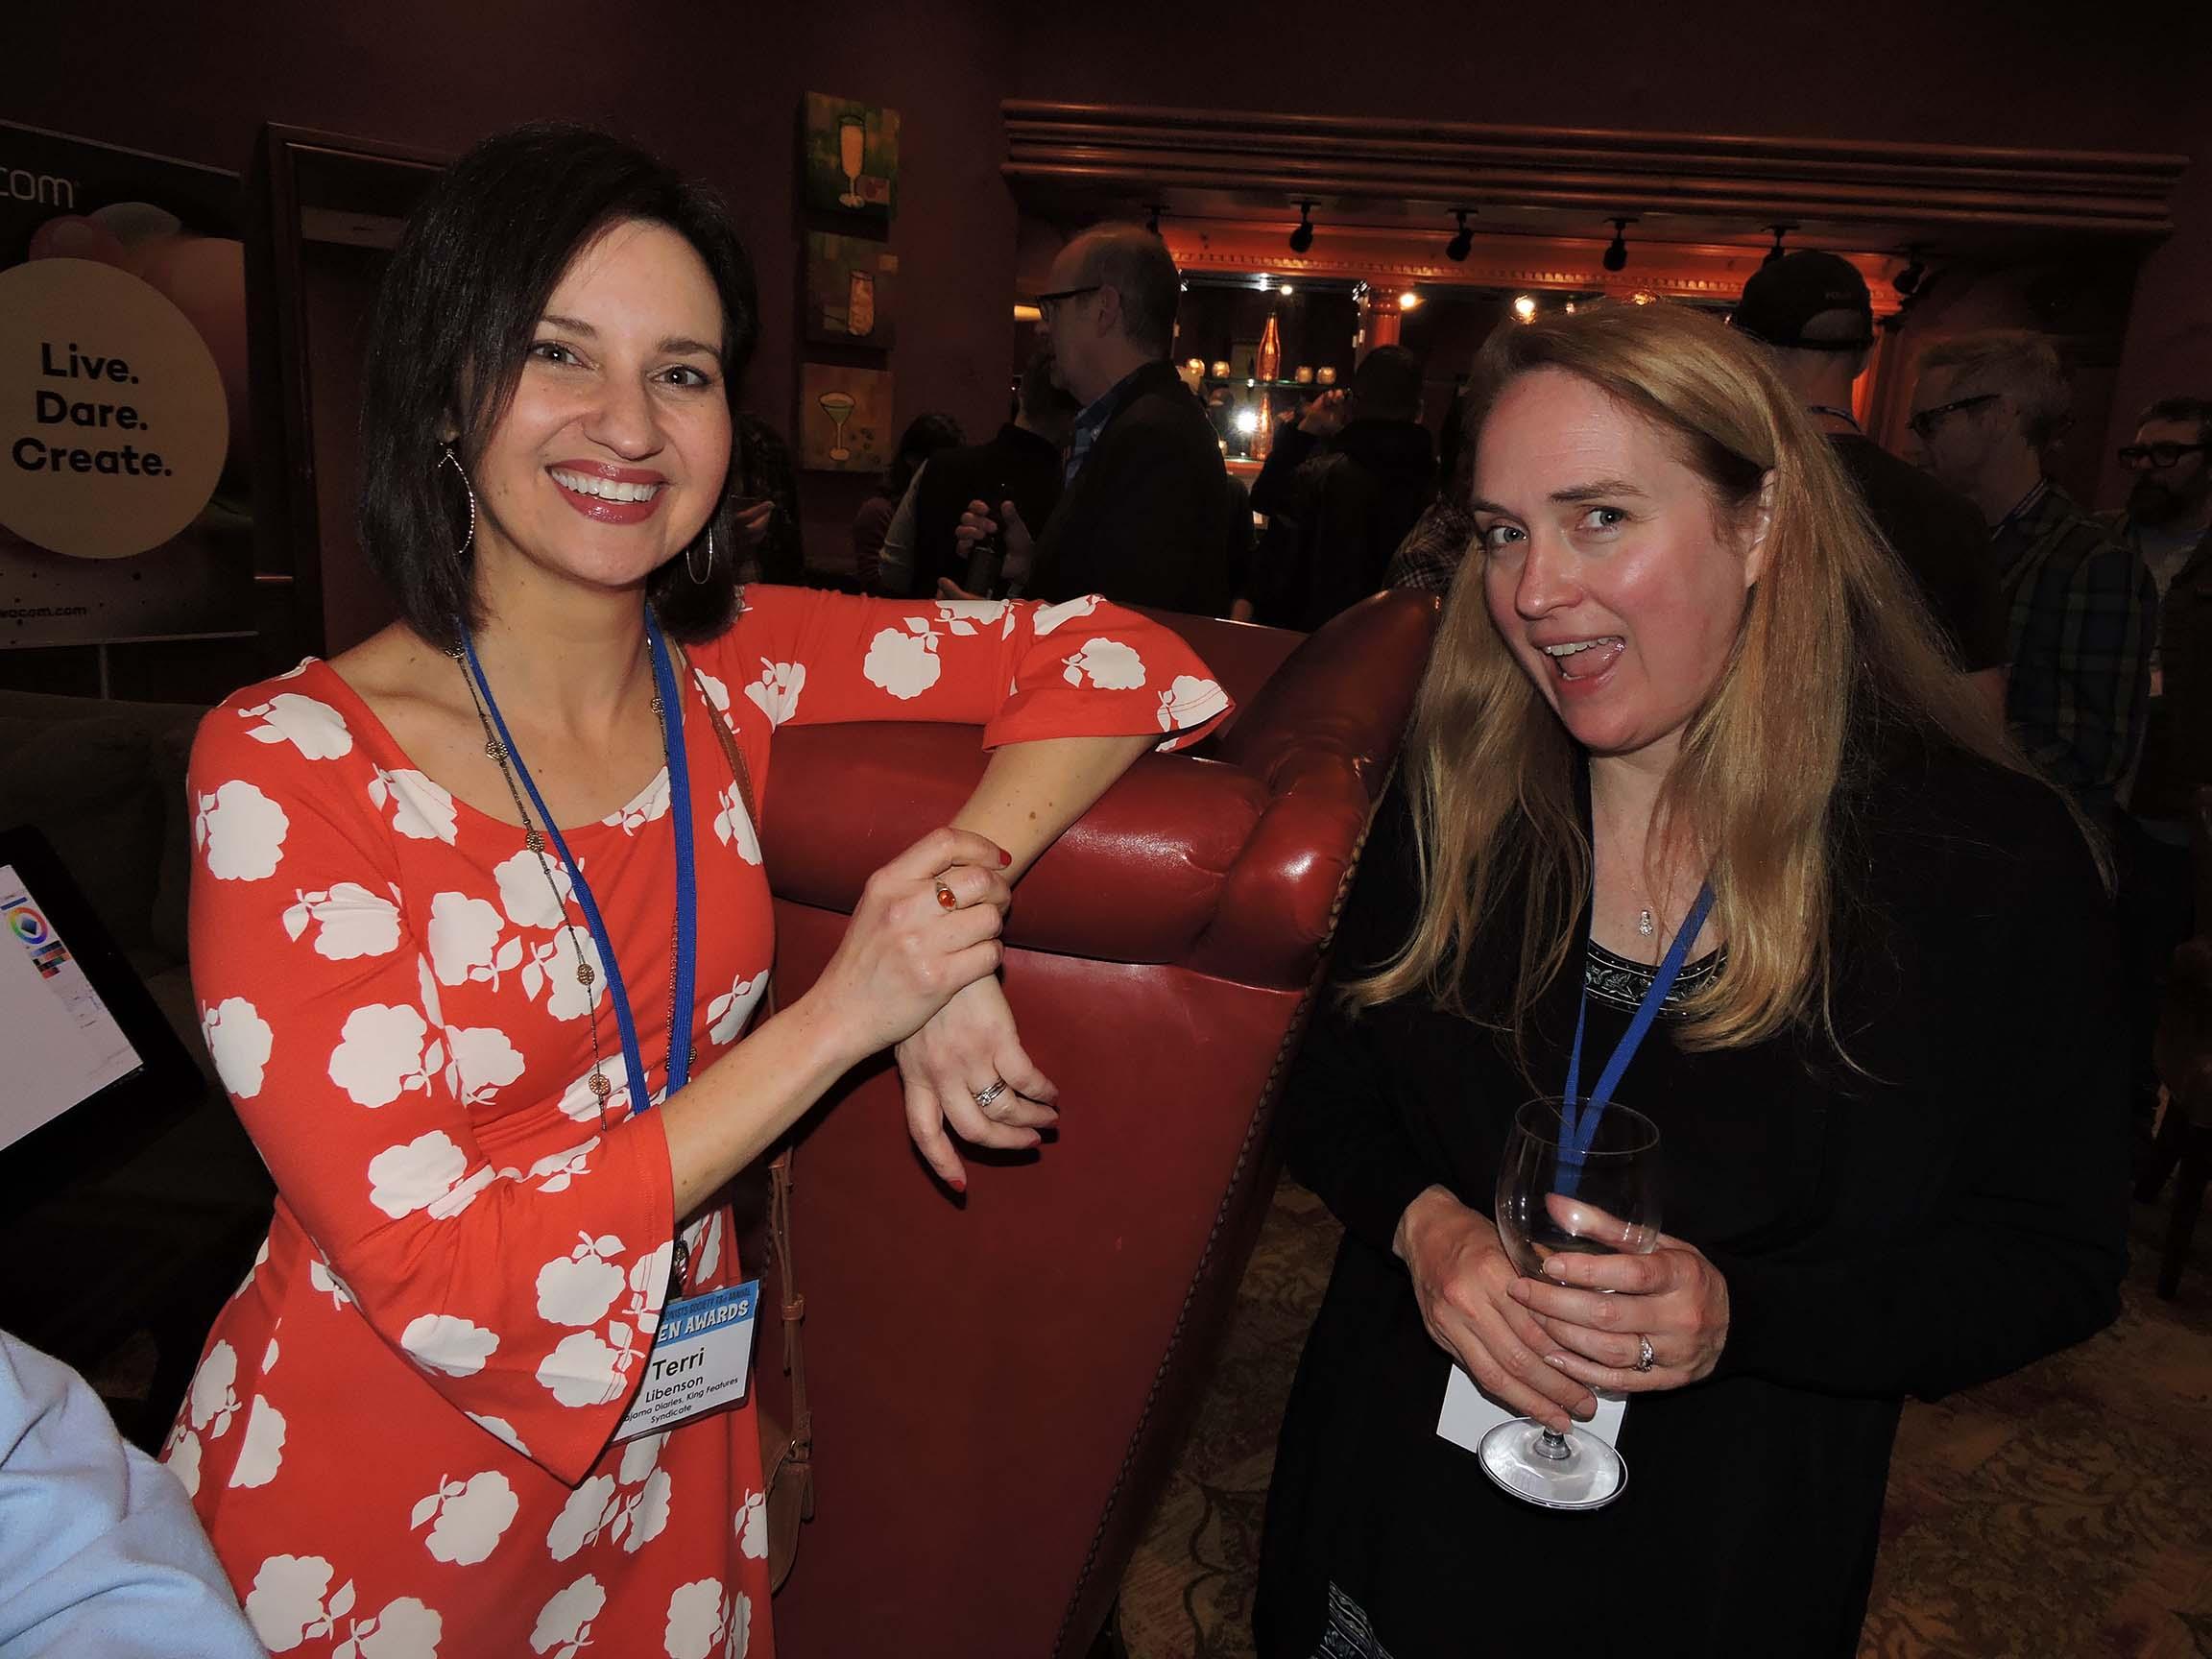 Terri Libenson (left) and Jenny Robb